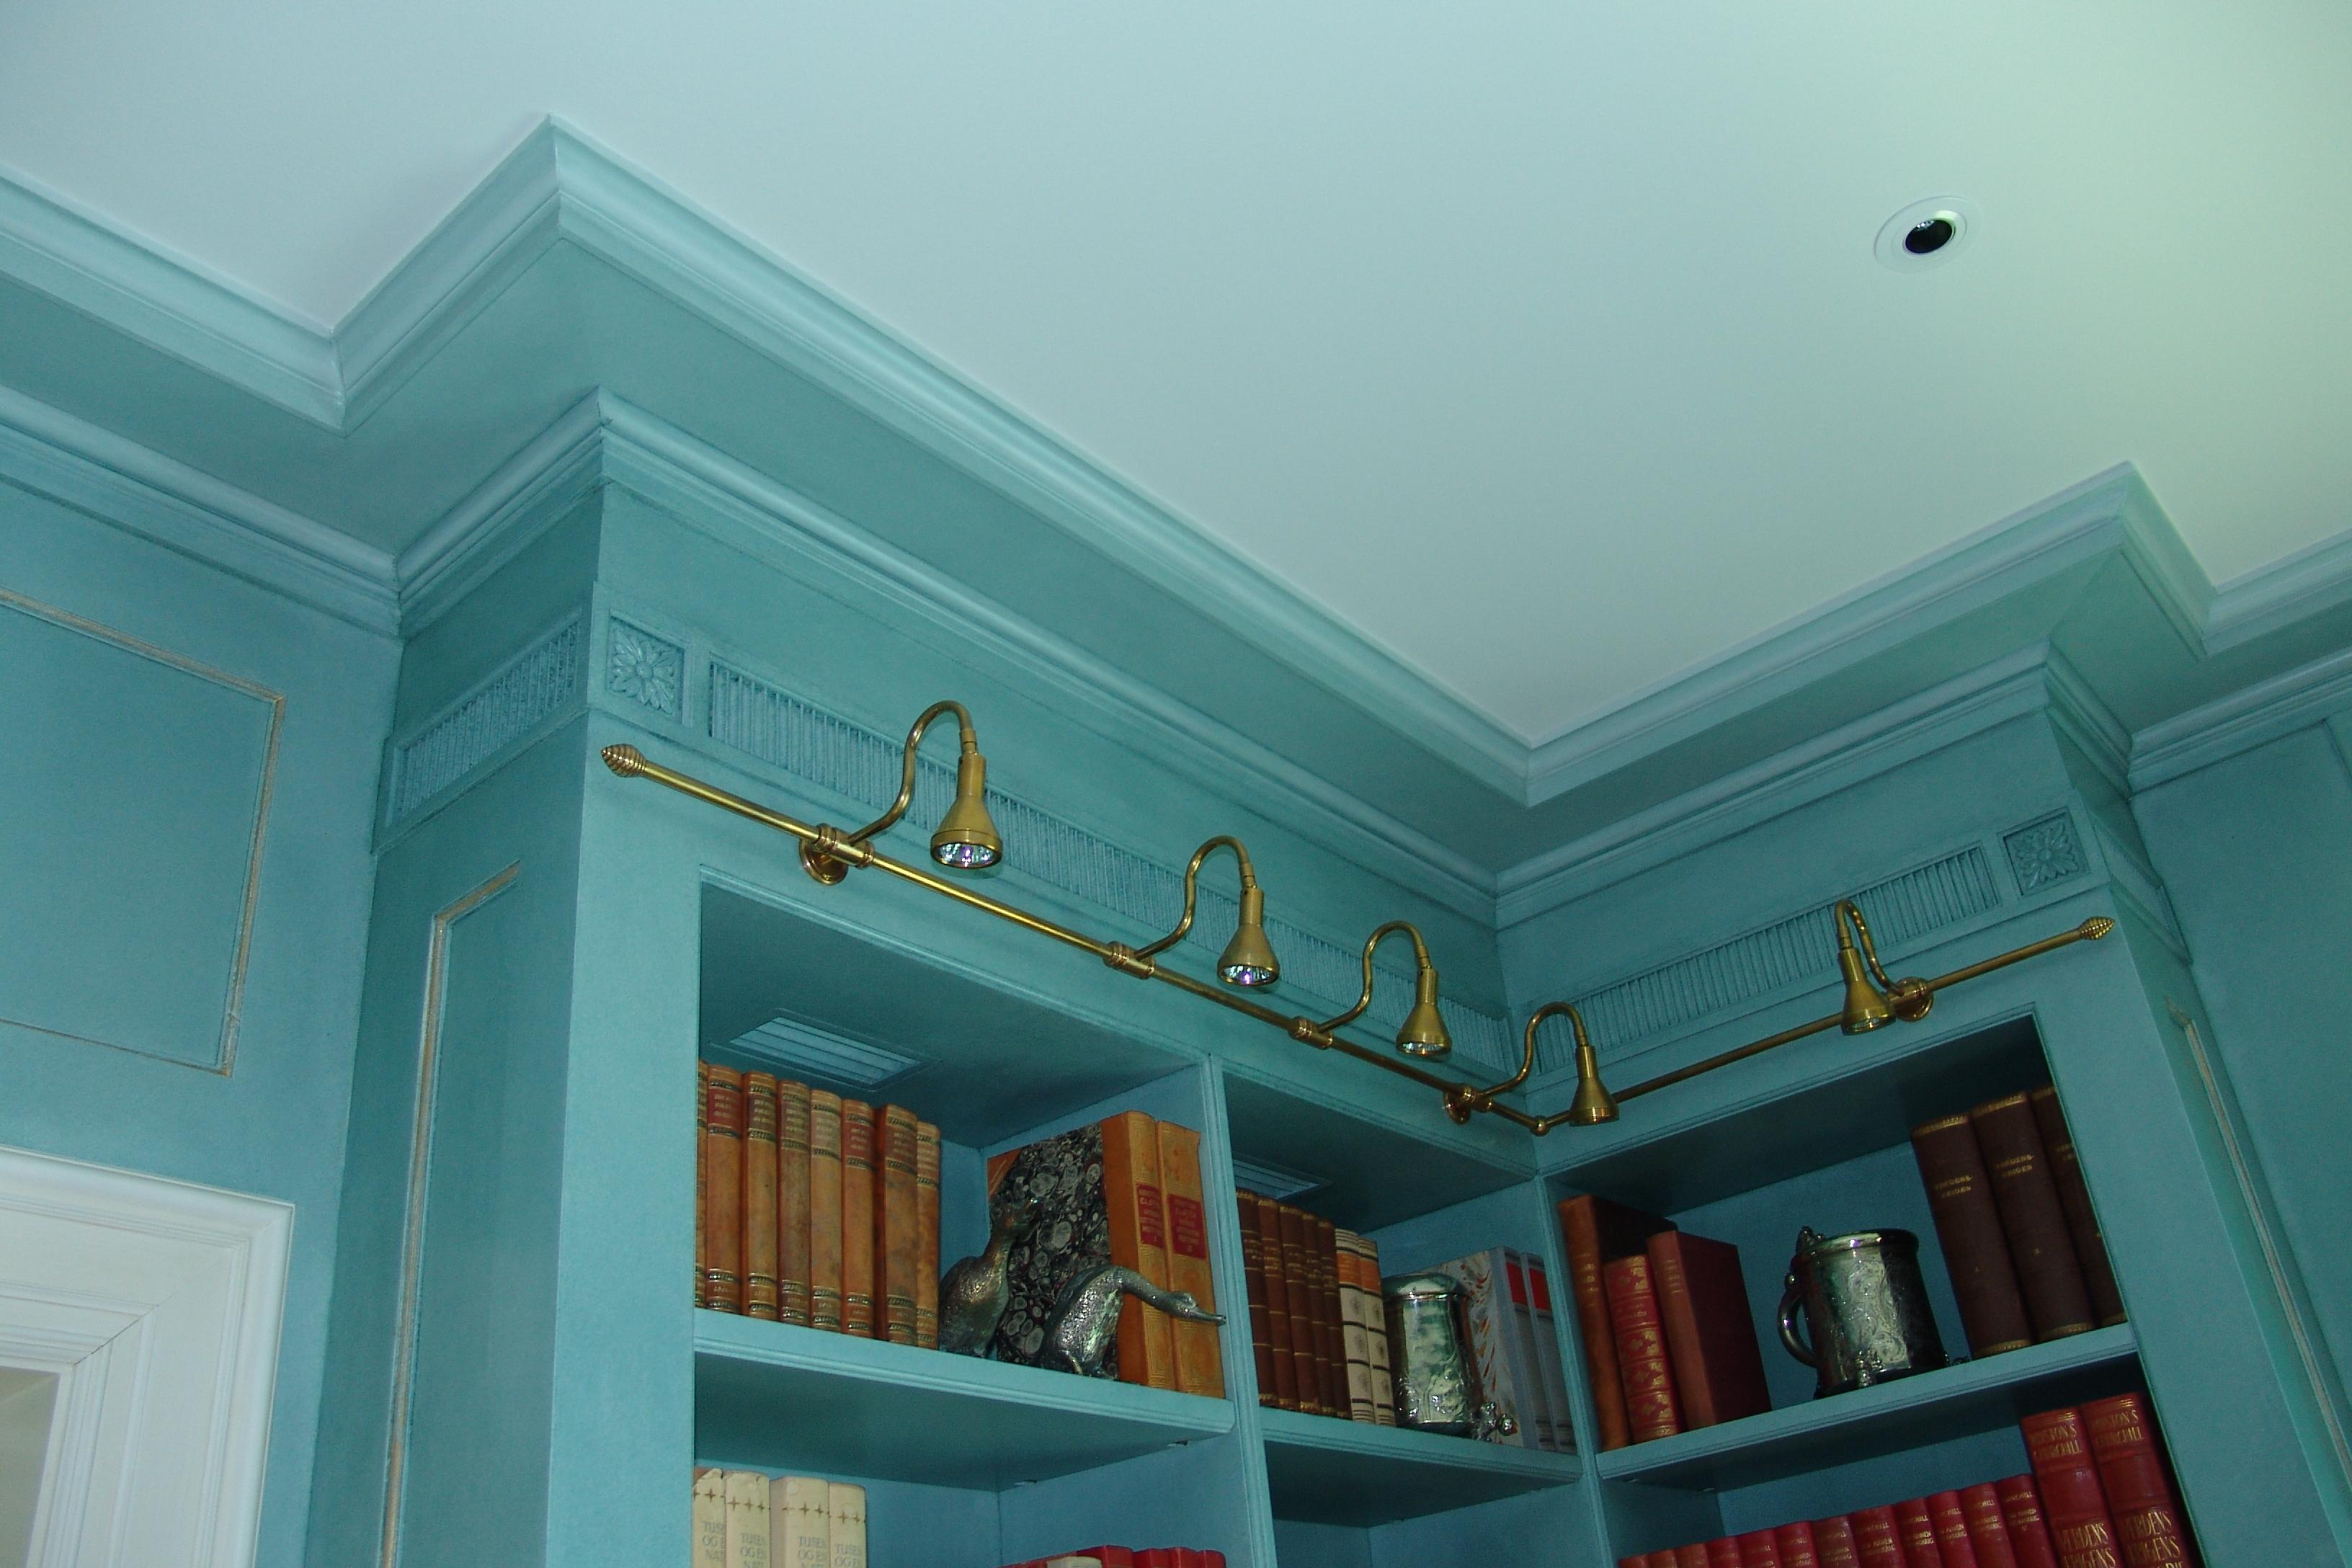 Bibliotek, taklister, ornamenter